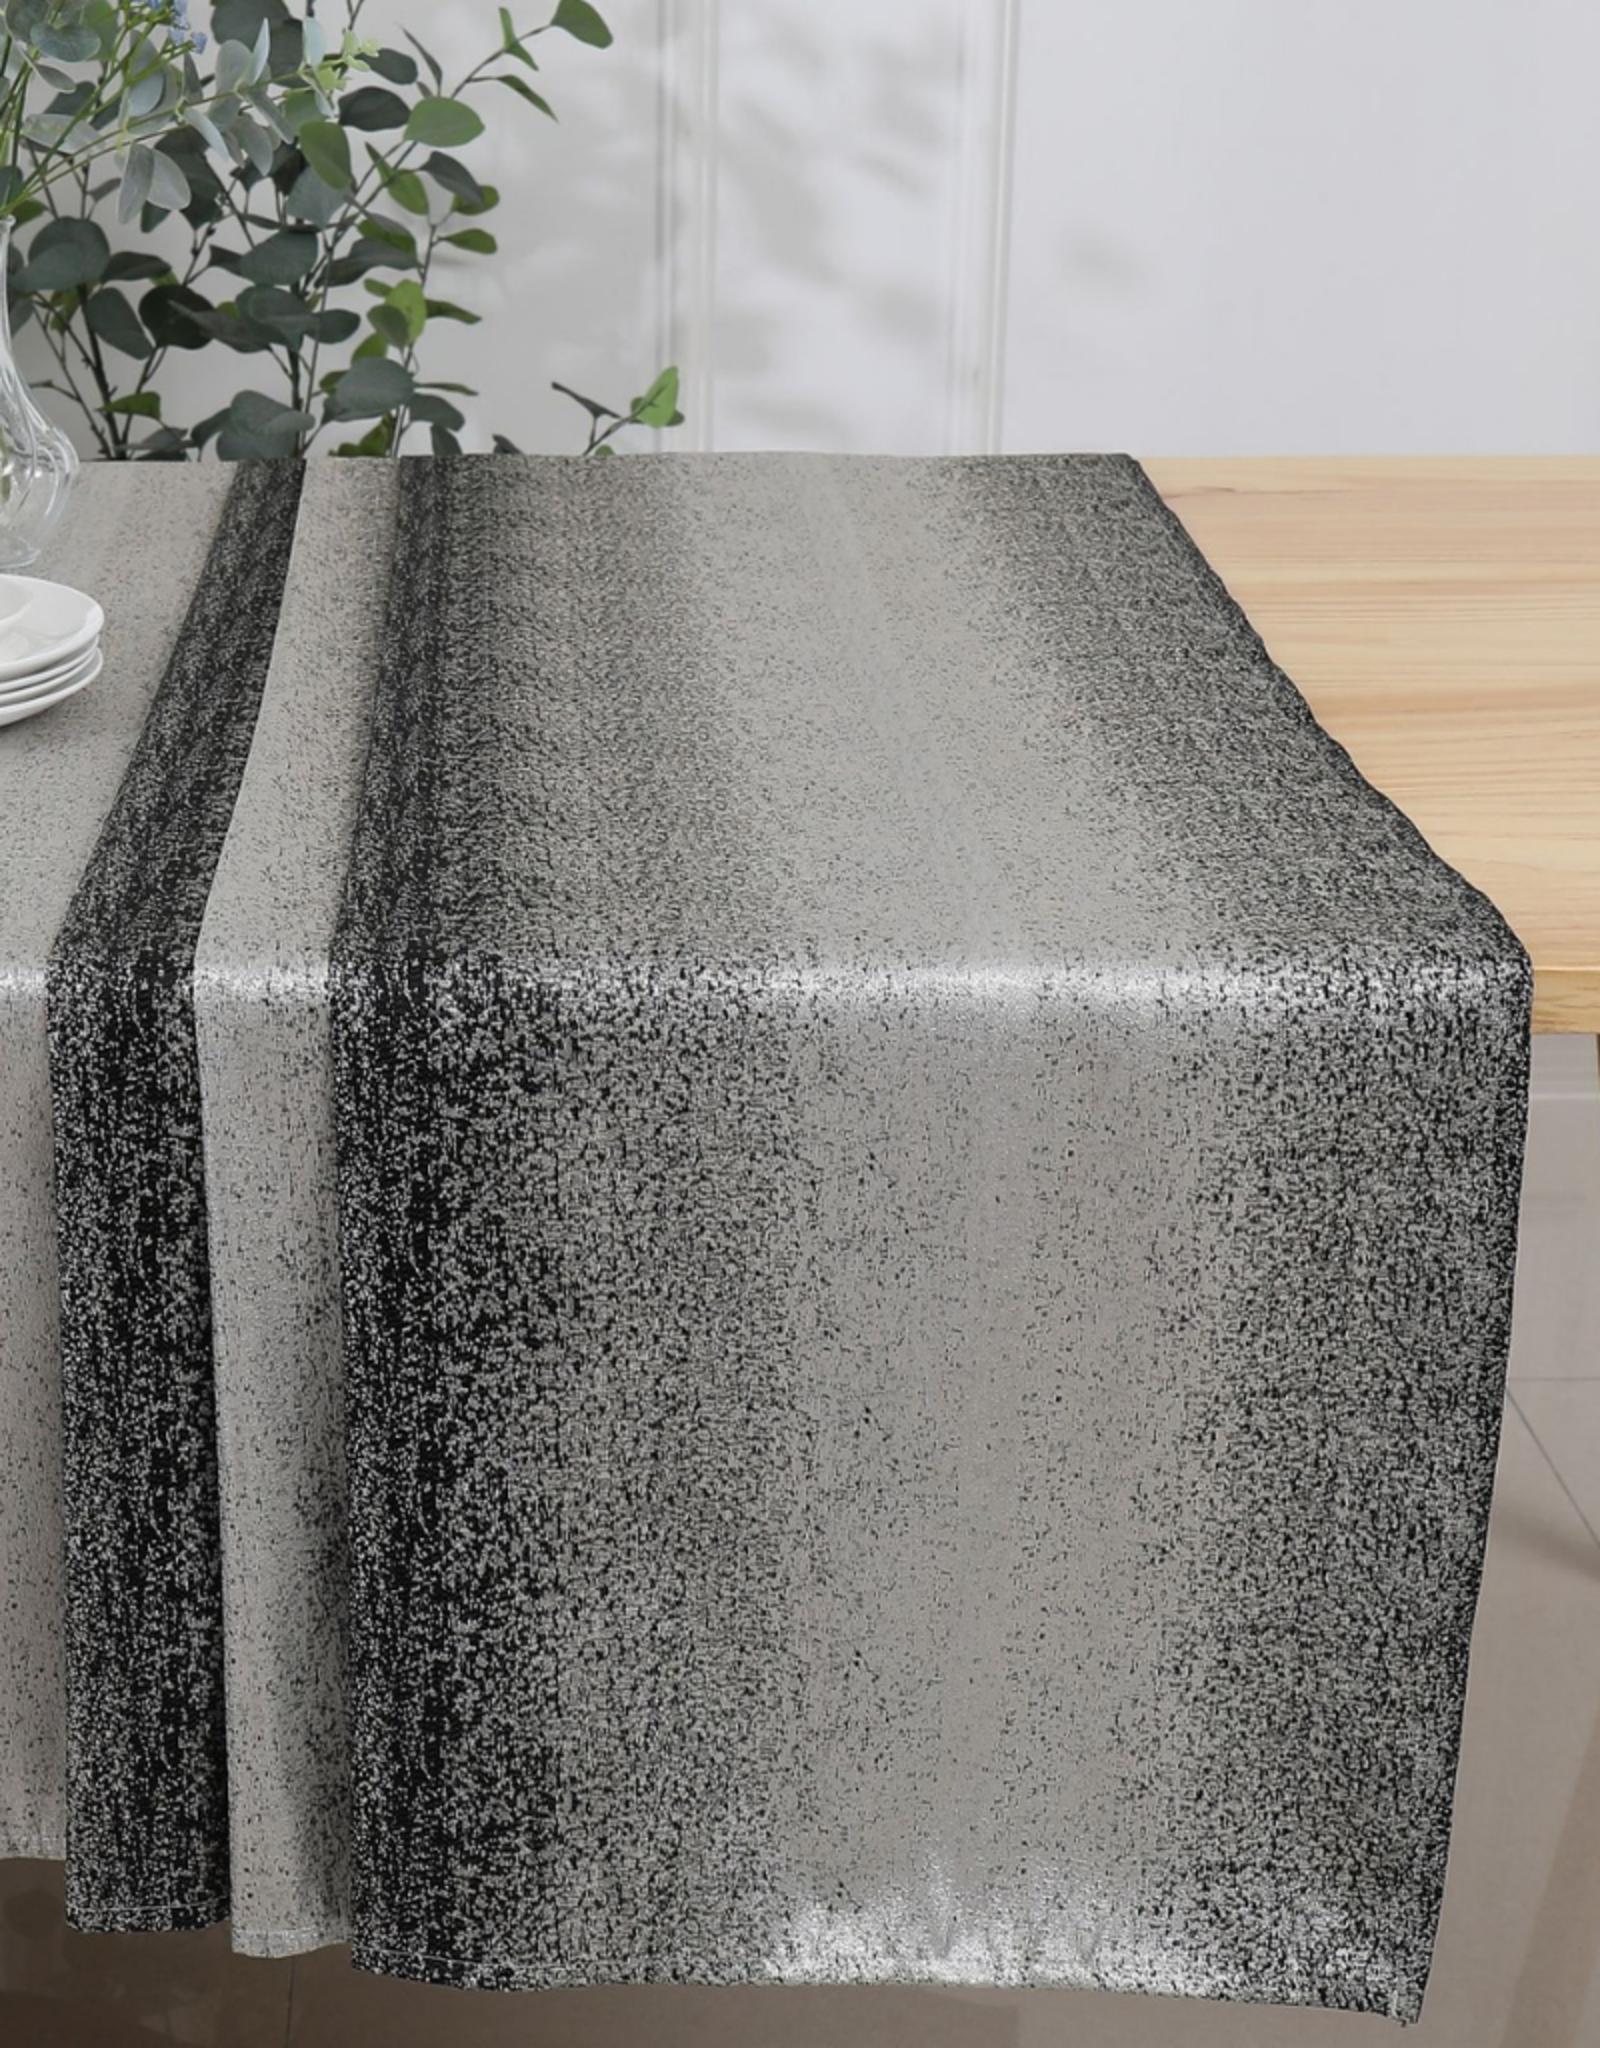 Jacquard Tablecloth Black/Silver #1203